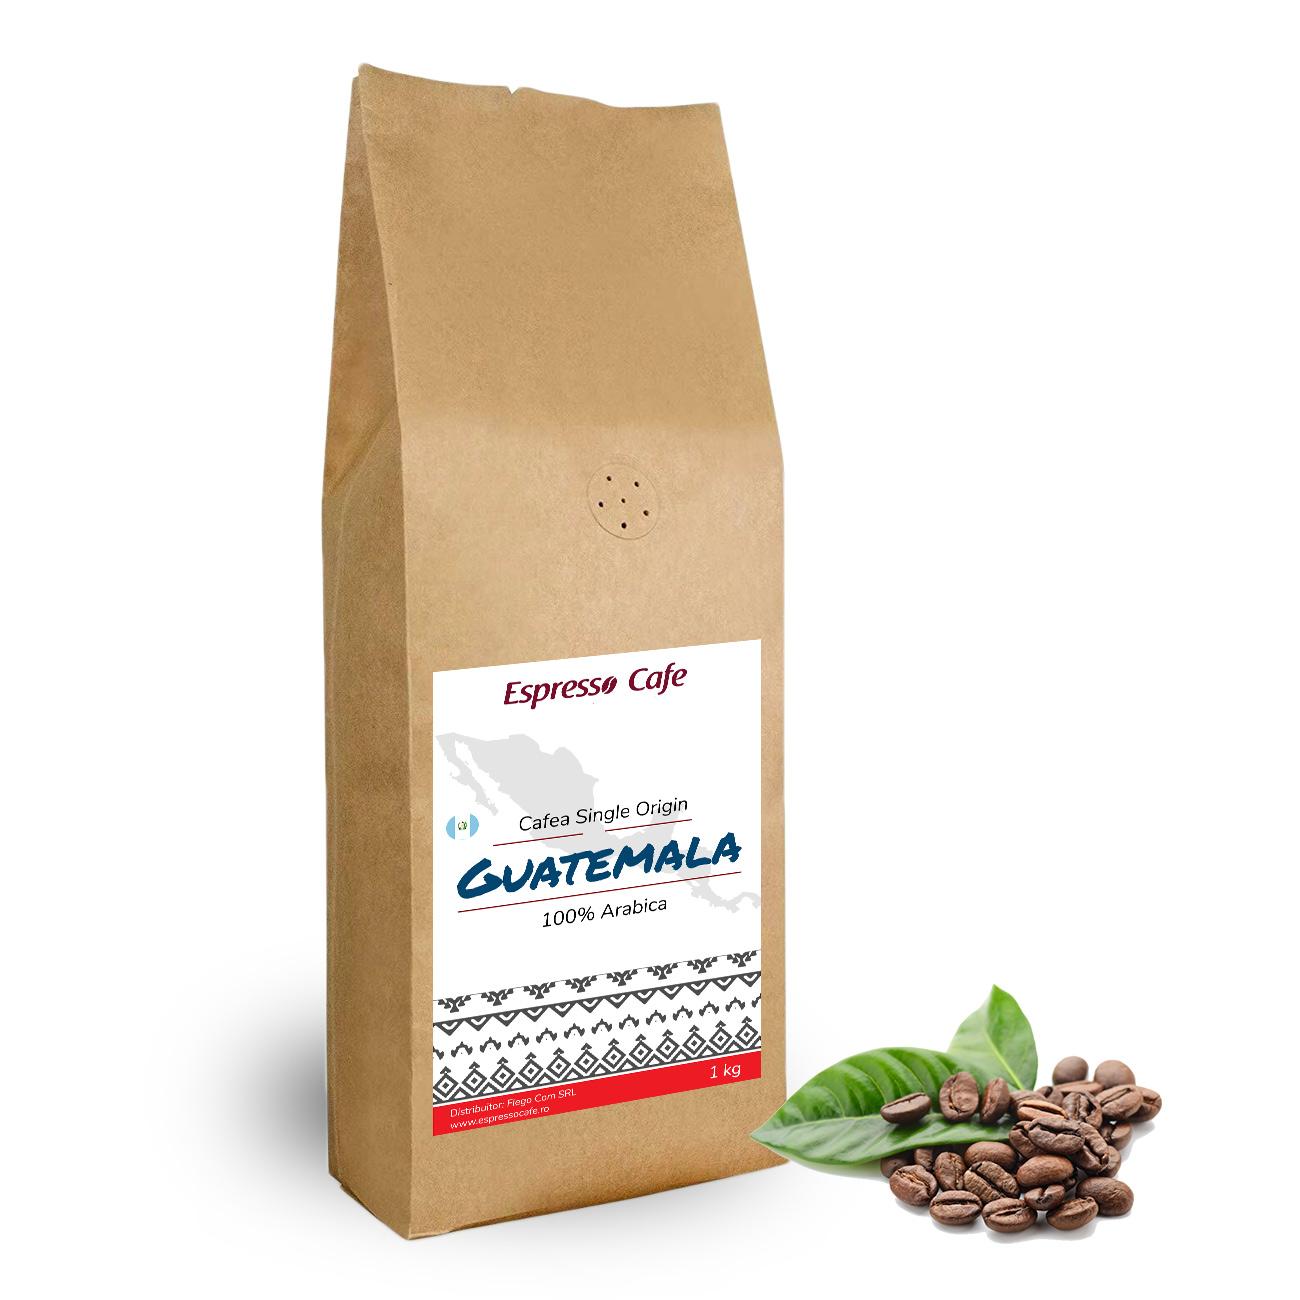 Guatemala cafea boabe de origine 1kg